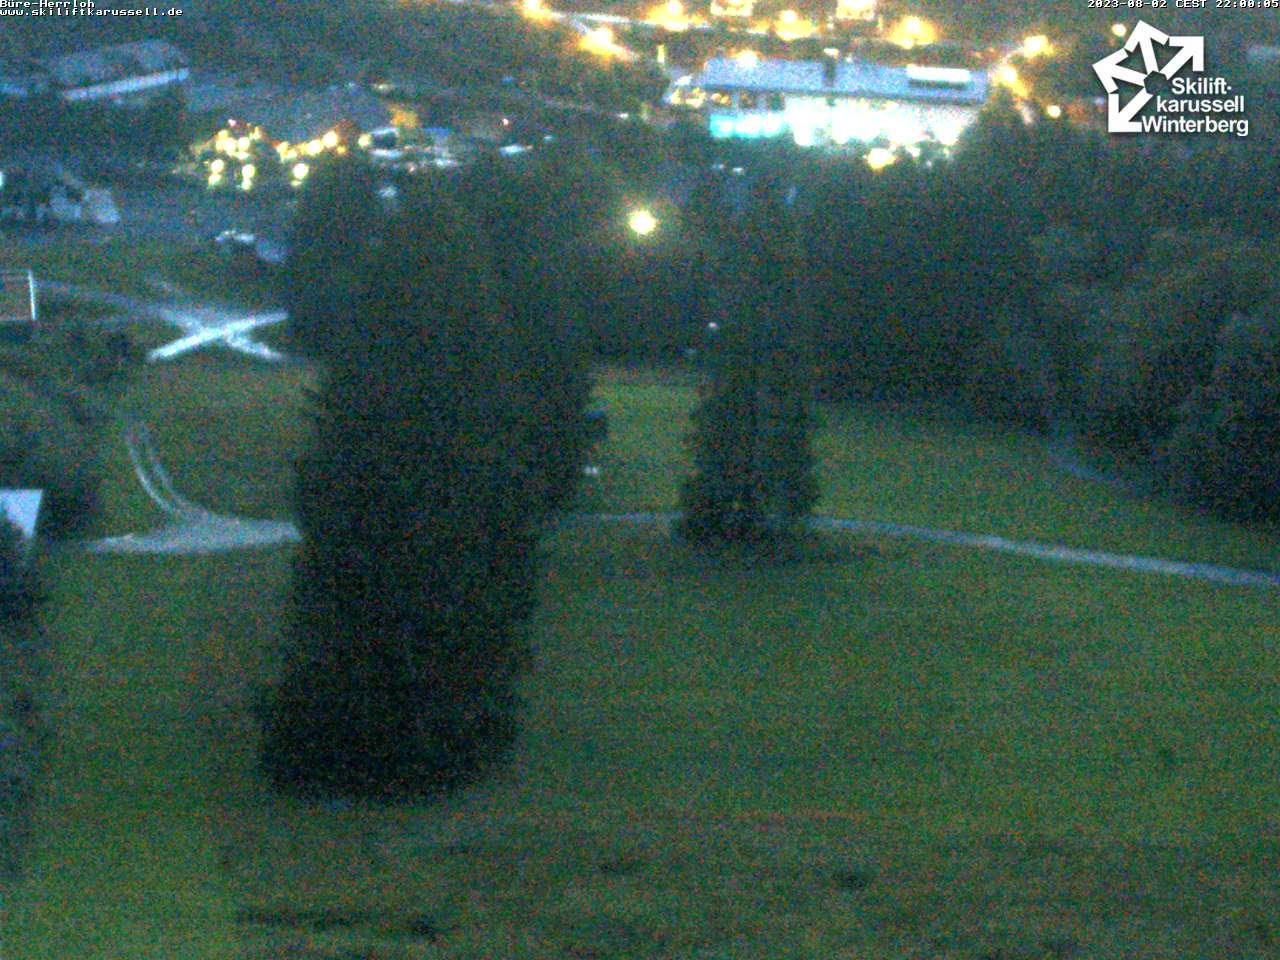 Webcam Büre-Herrloh - Skiliftkarussell Winterberg